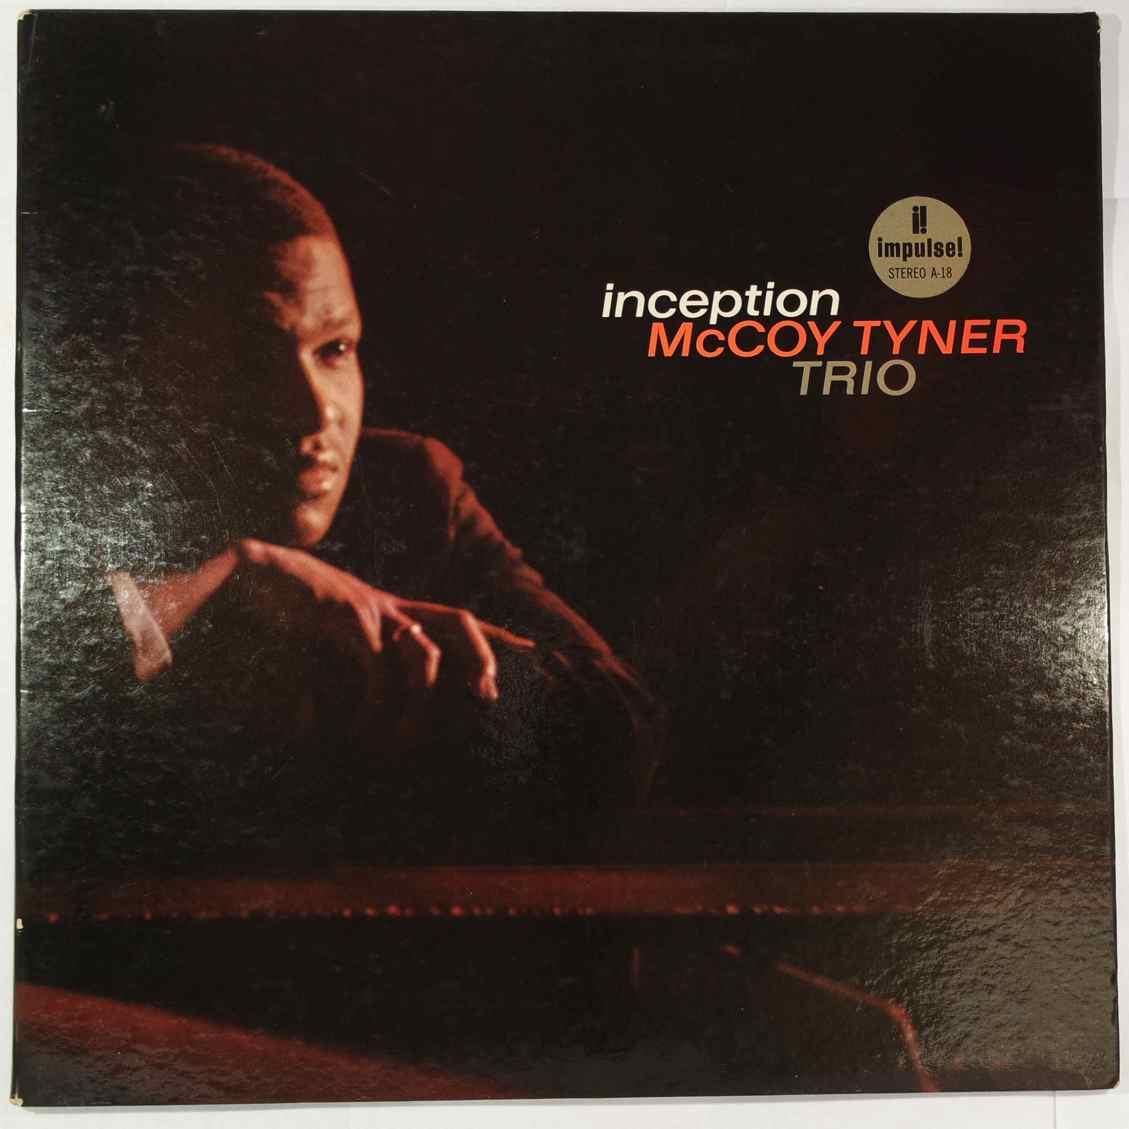 MCCOY TYNER TRIO - Inception - LP